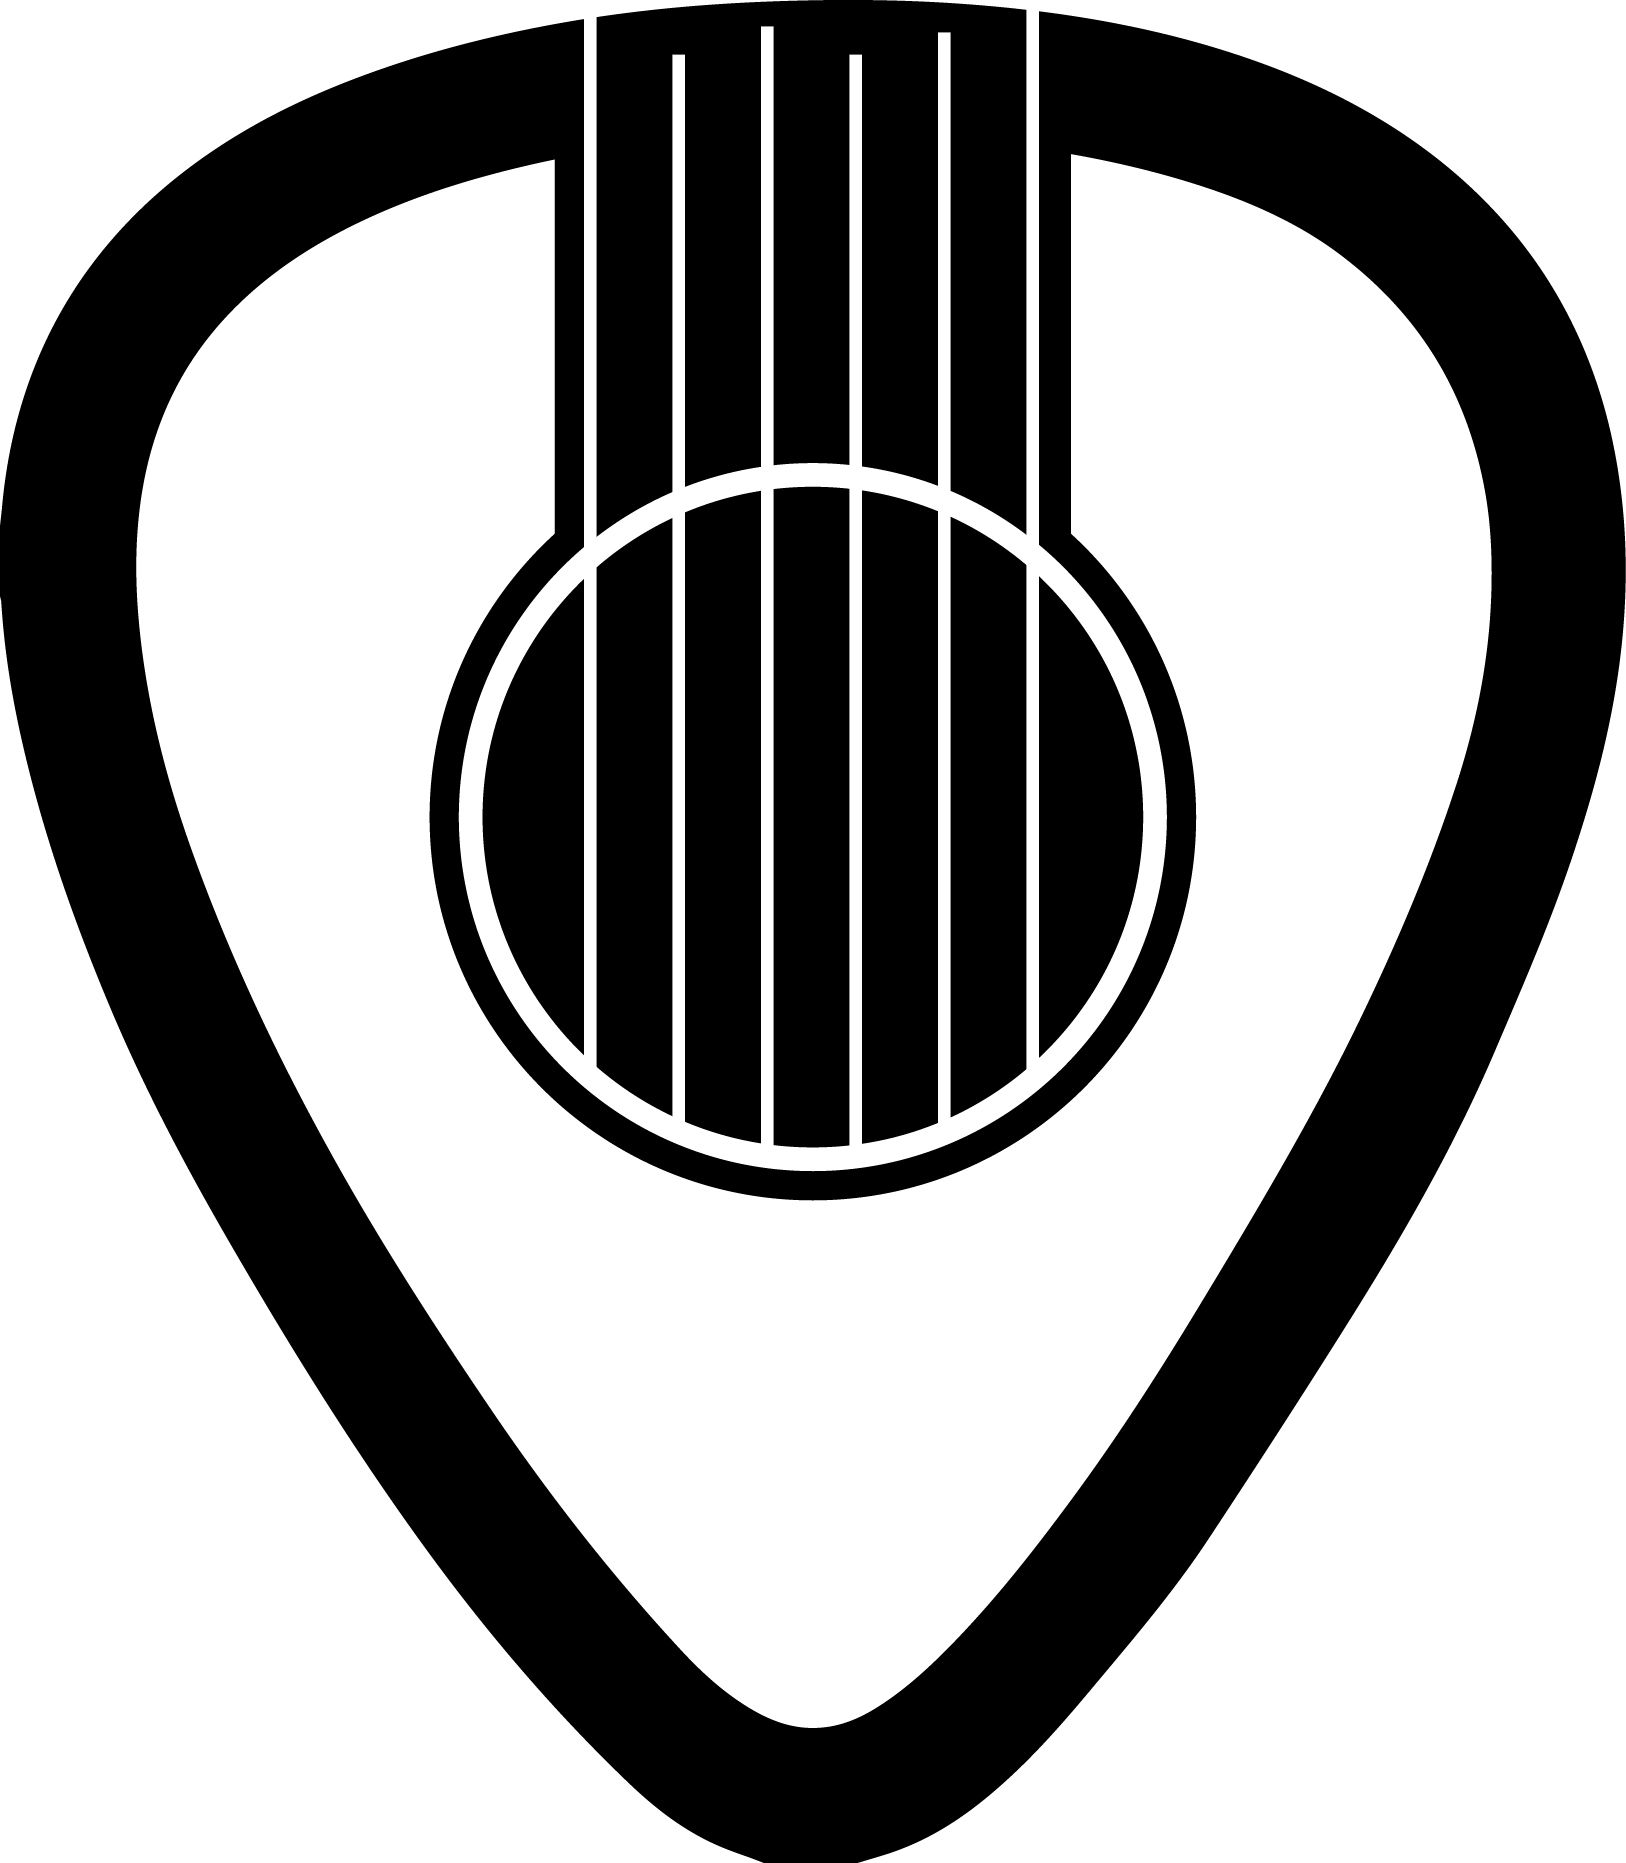 Guitar Pick Sound Hole Tattoo